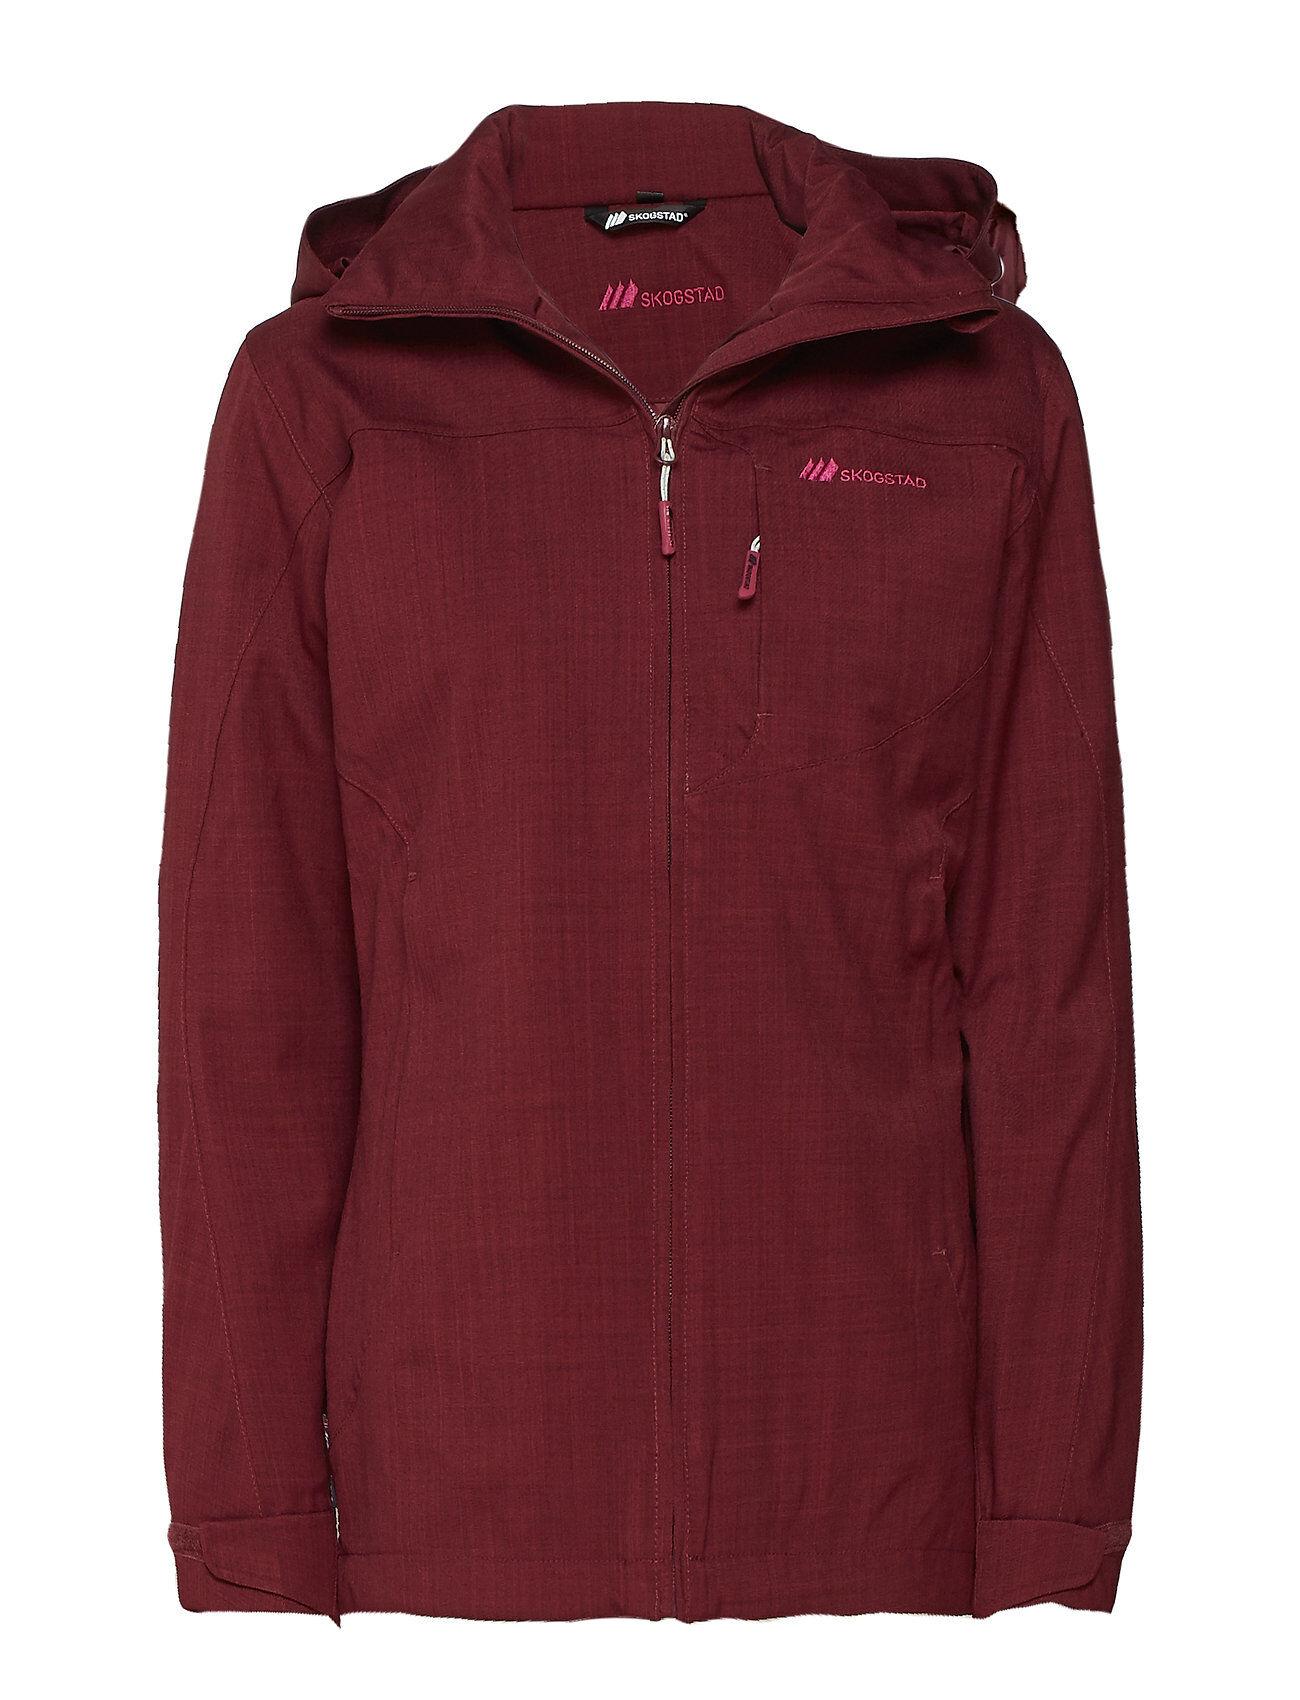 Skogstad Branden 2-Layer Technical Jacket Outerwear Sport Jackets Punainen